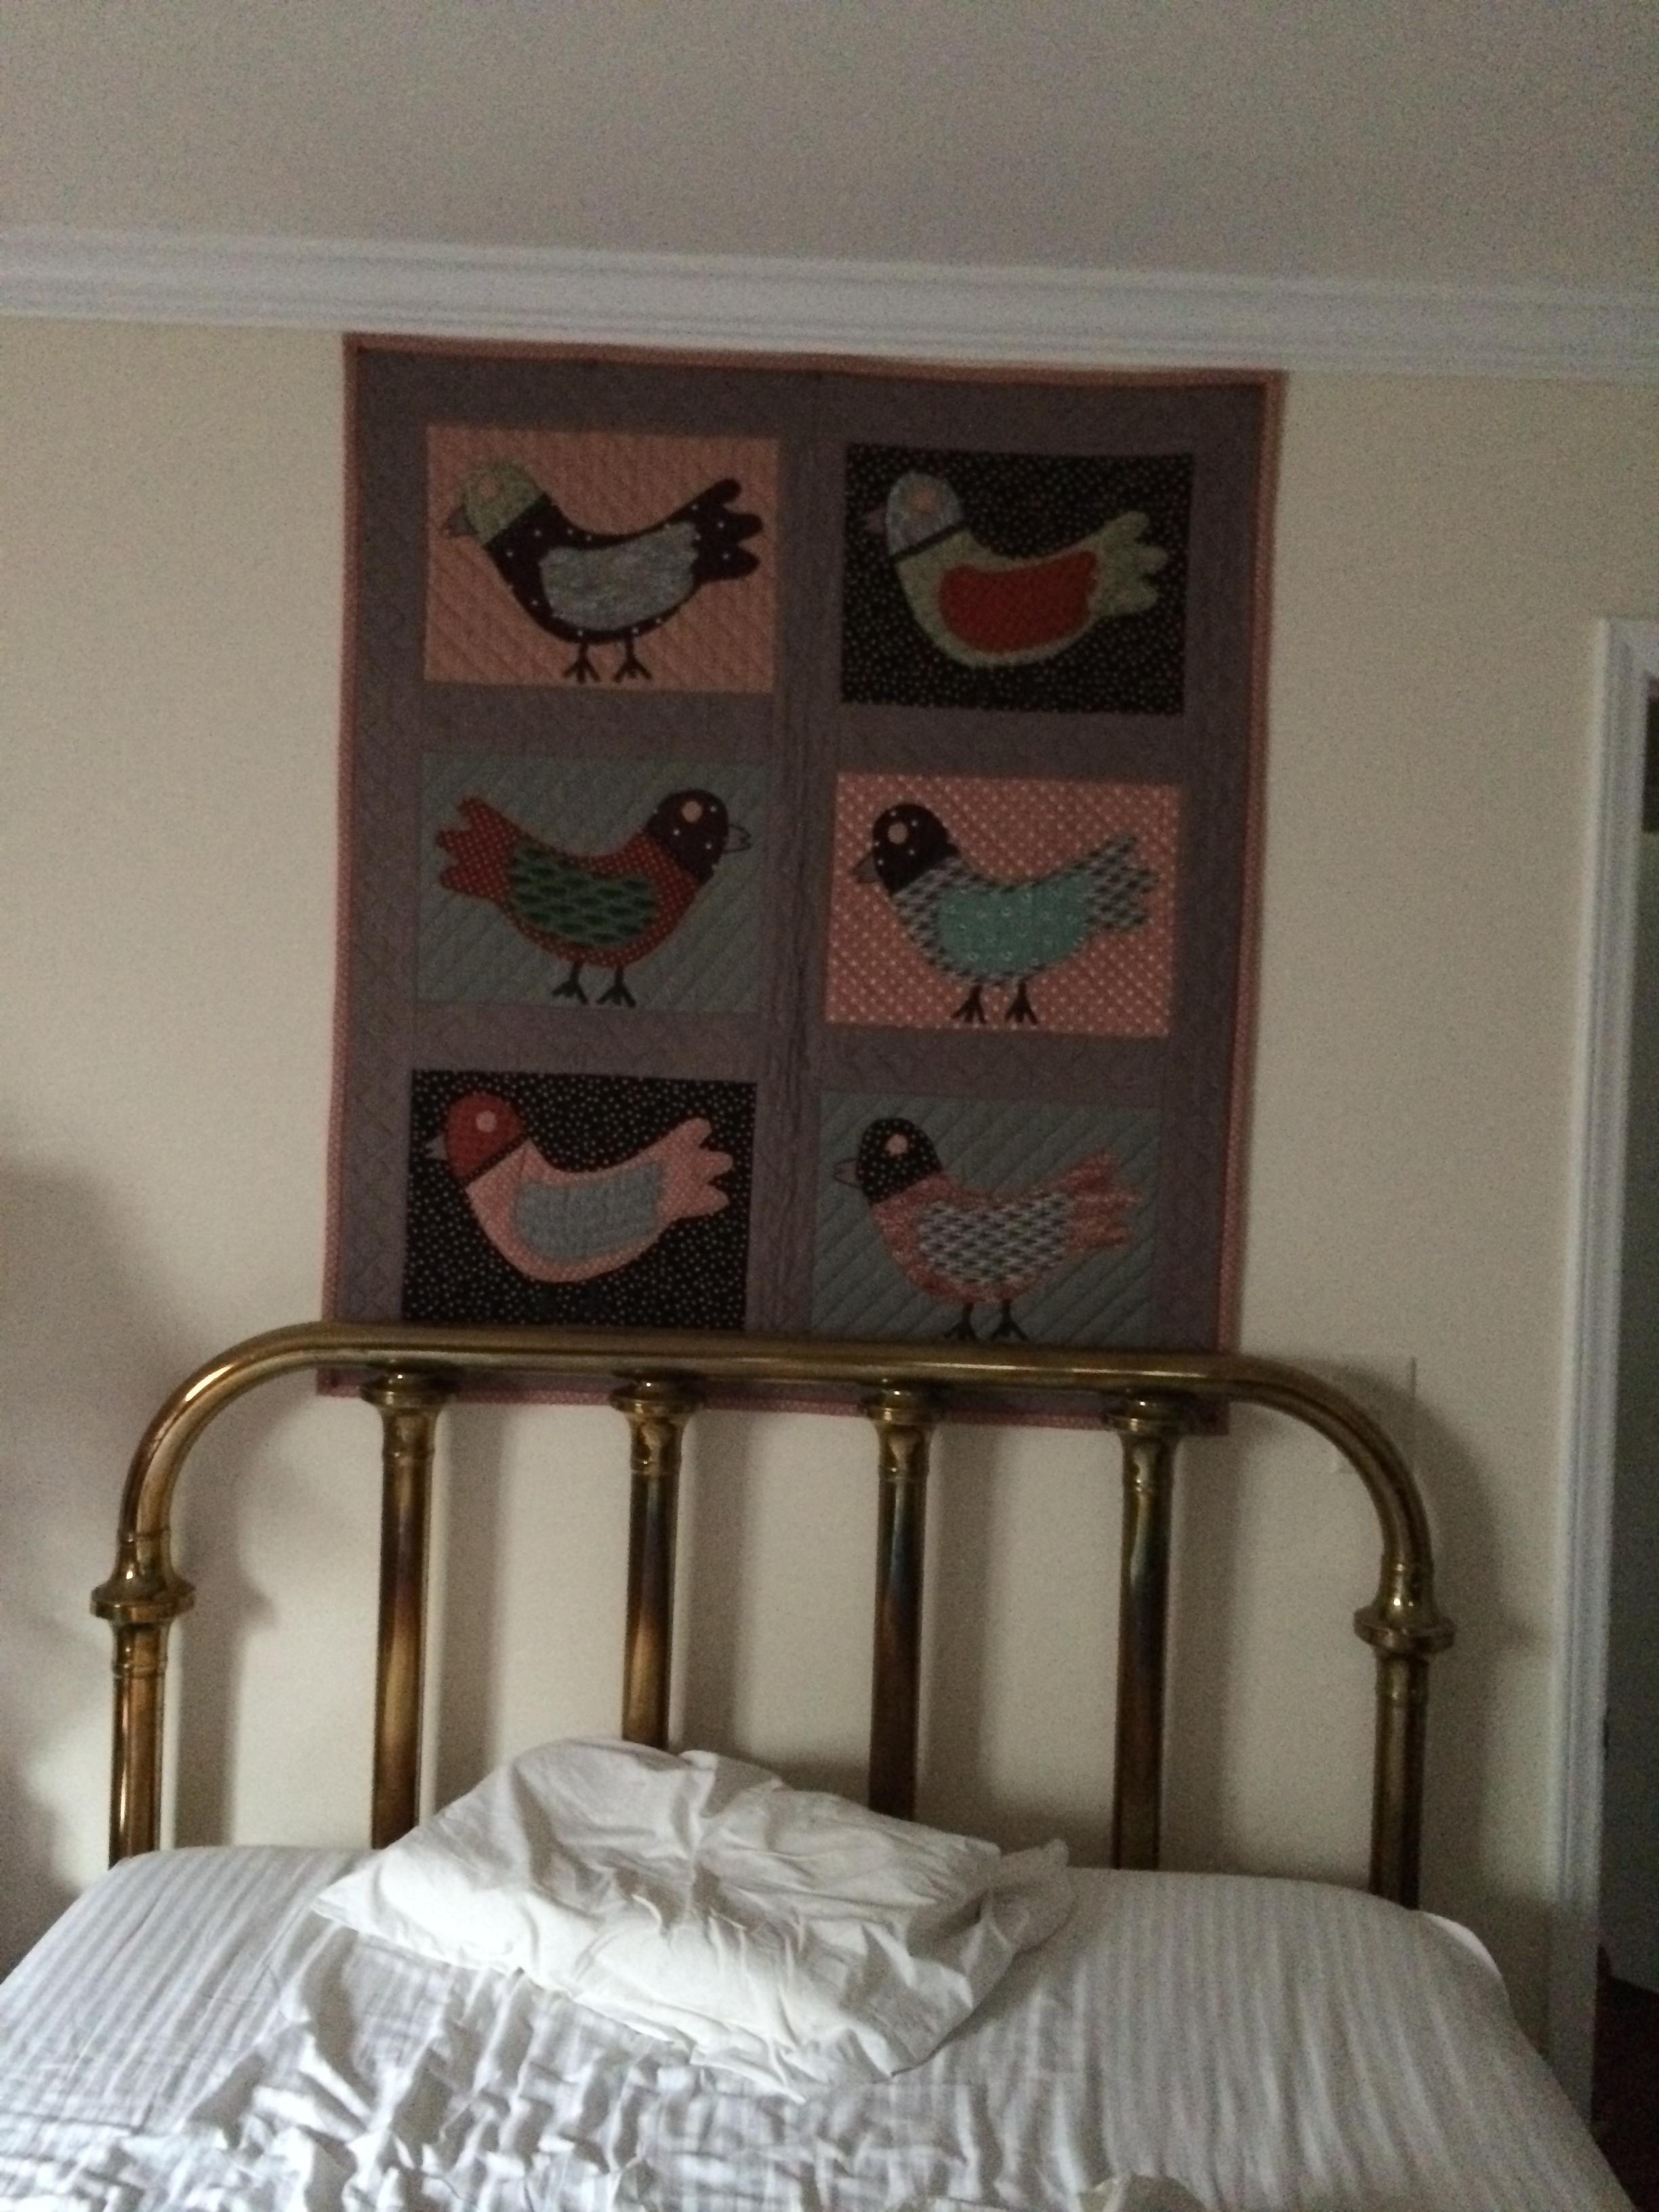 The original Twitter birds